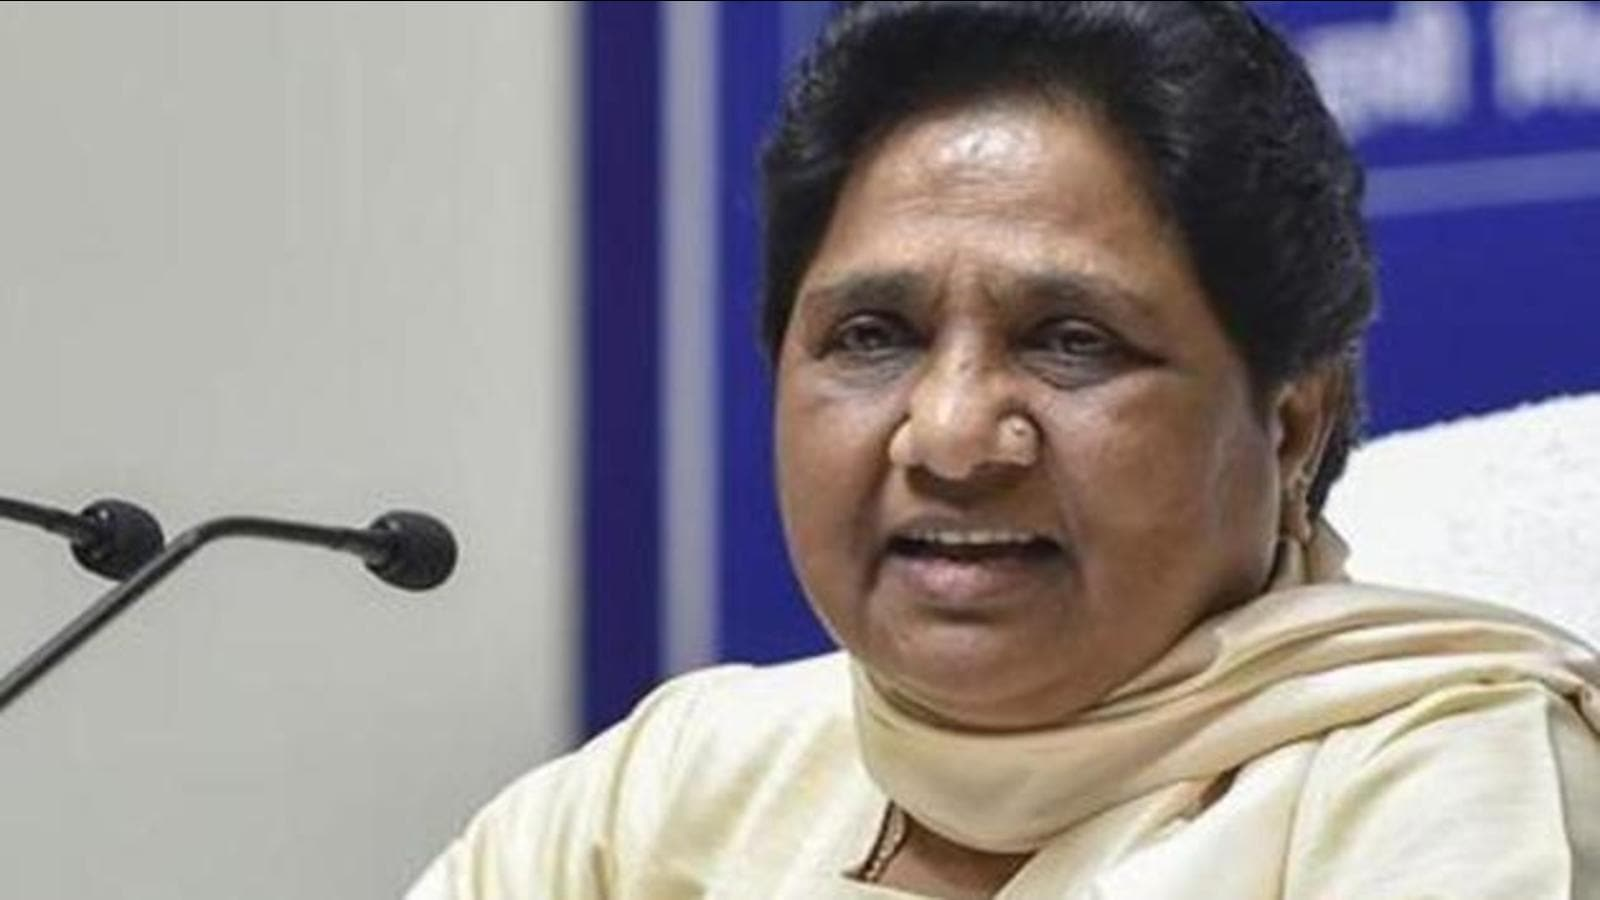 Custodial death: After Priyanka visit, Mayawati rushes team to Agra